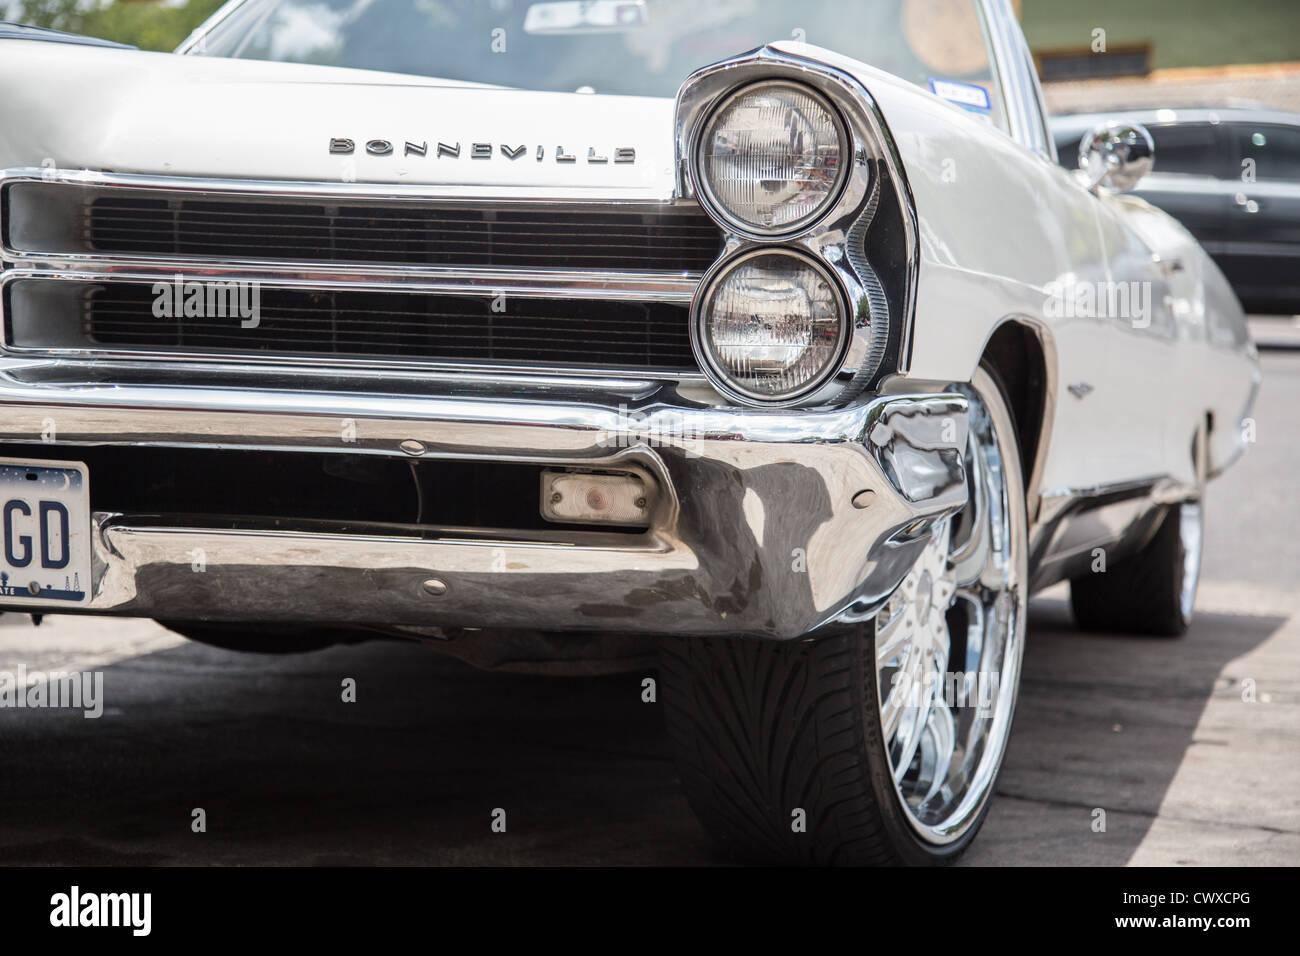 White classic convertible Pontiac Bonneville lowrider car on the street in Austin, Texas - Stock Image